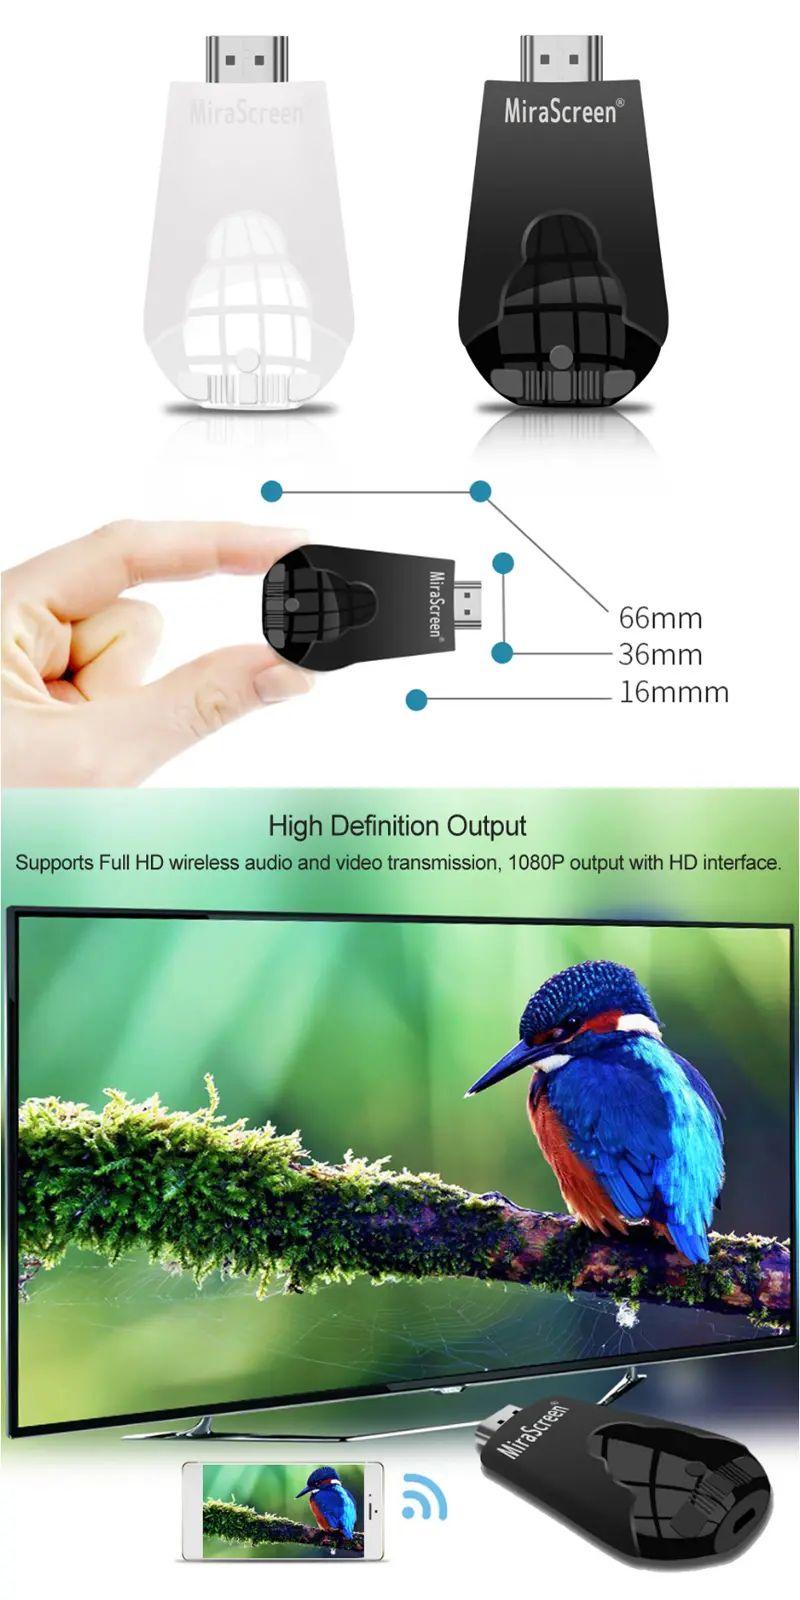 Mirascreen k4 1080p hd miracast air play dlna (6)